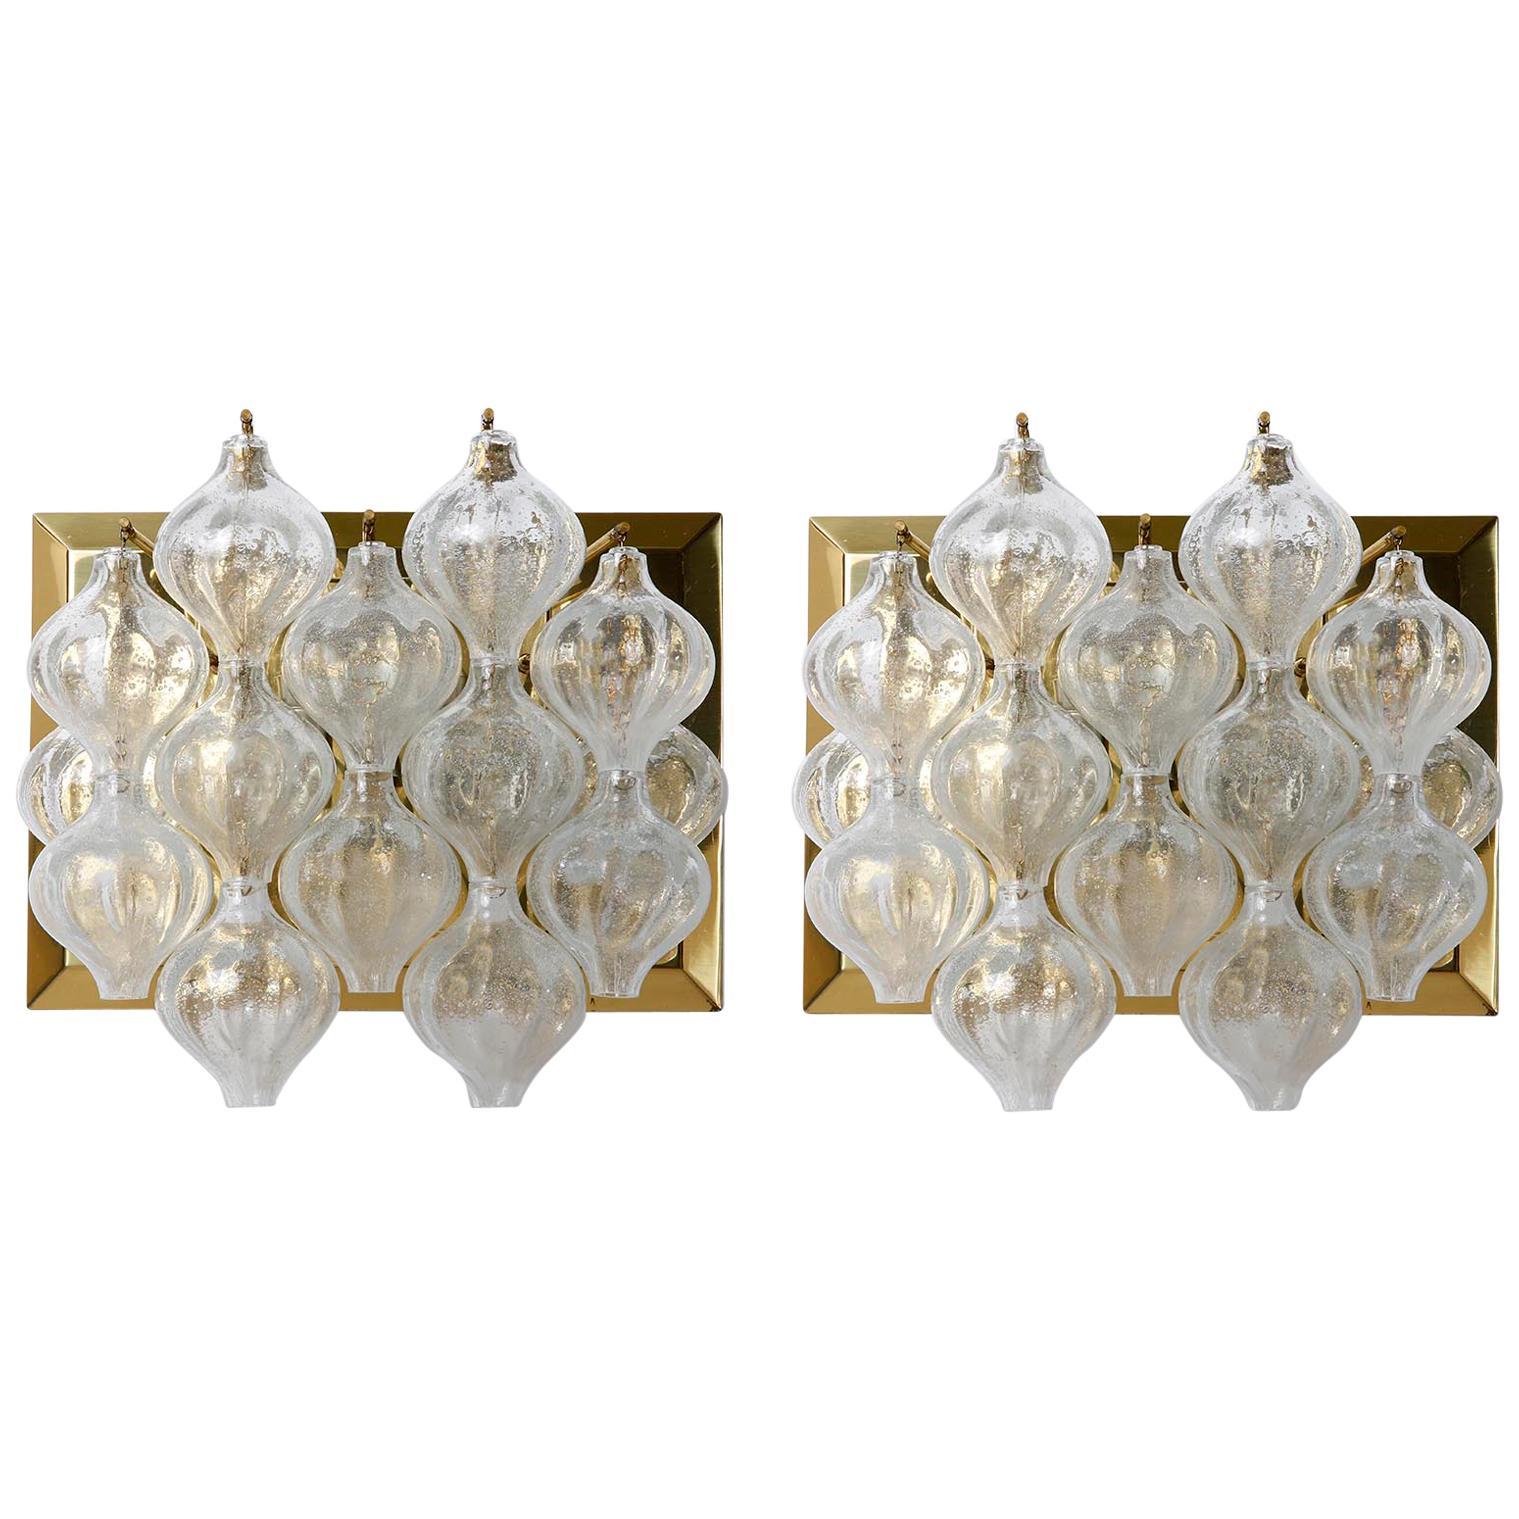 Pair of Large Kalmar 'Tulipan' Wall Lights Sconces, Glass Brass, 1960s